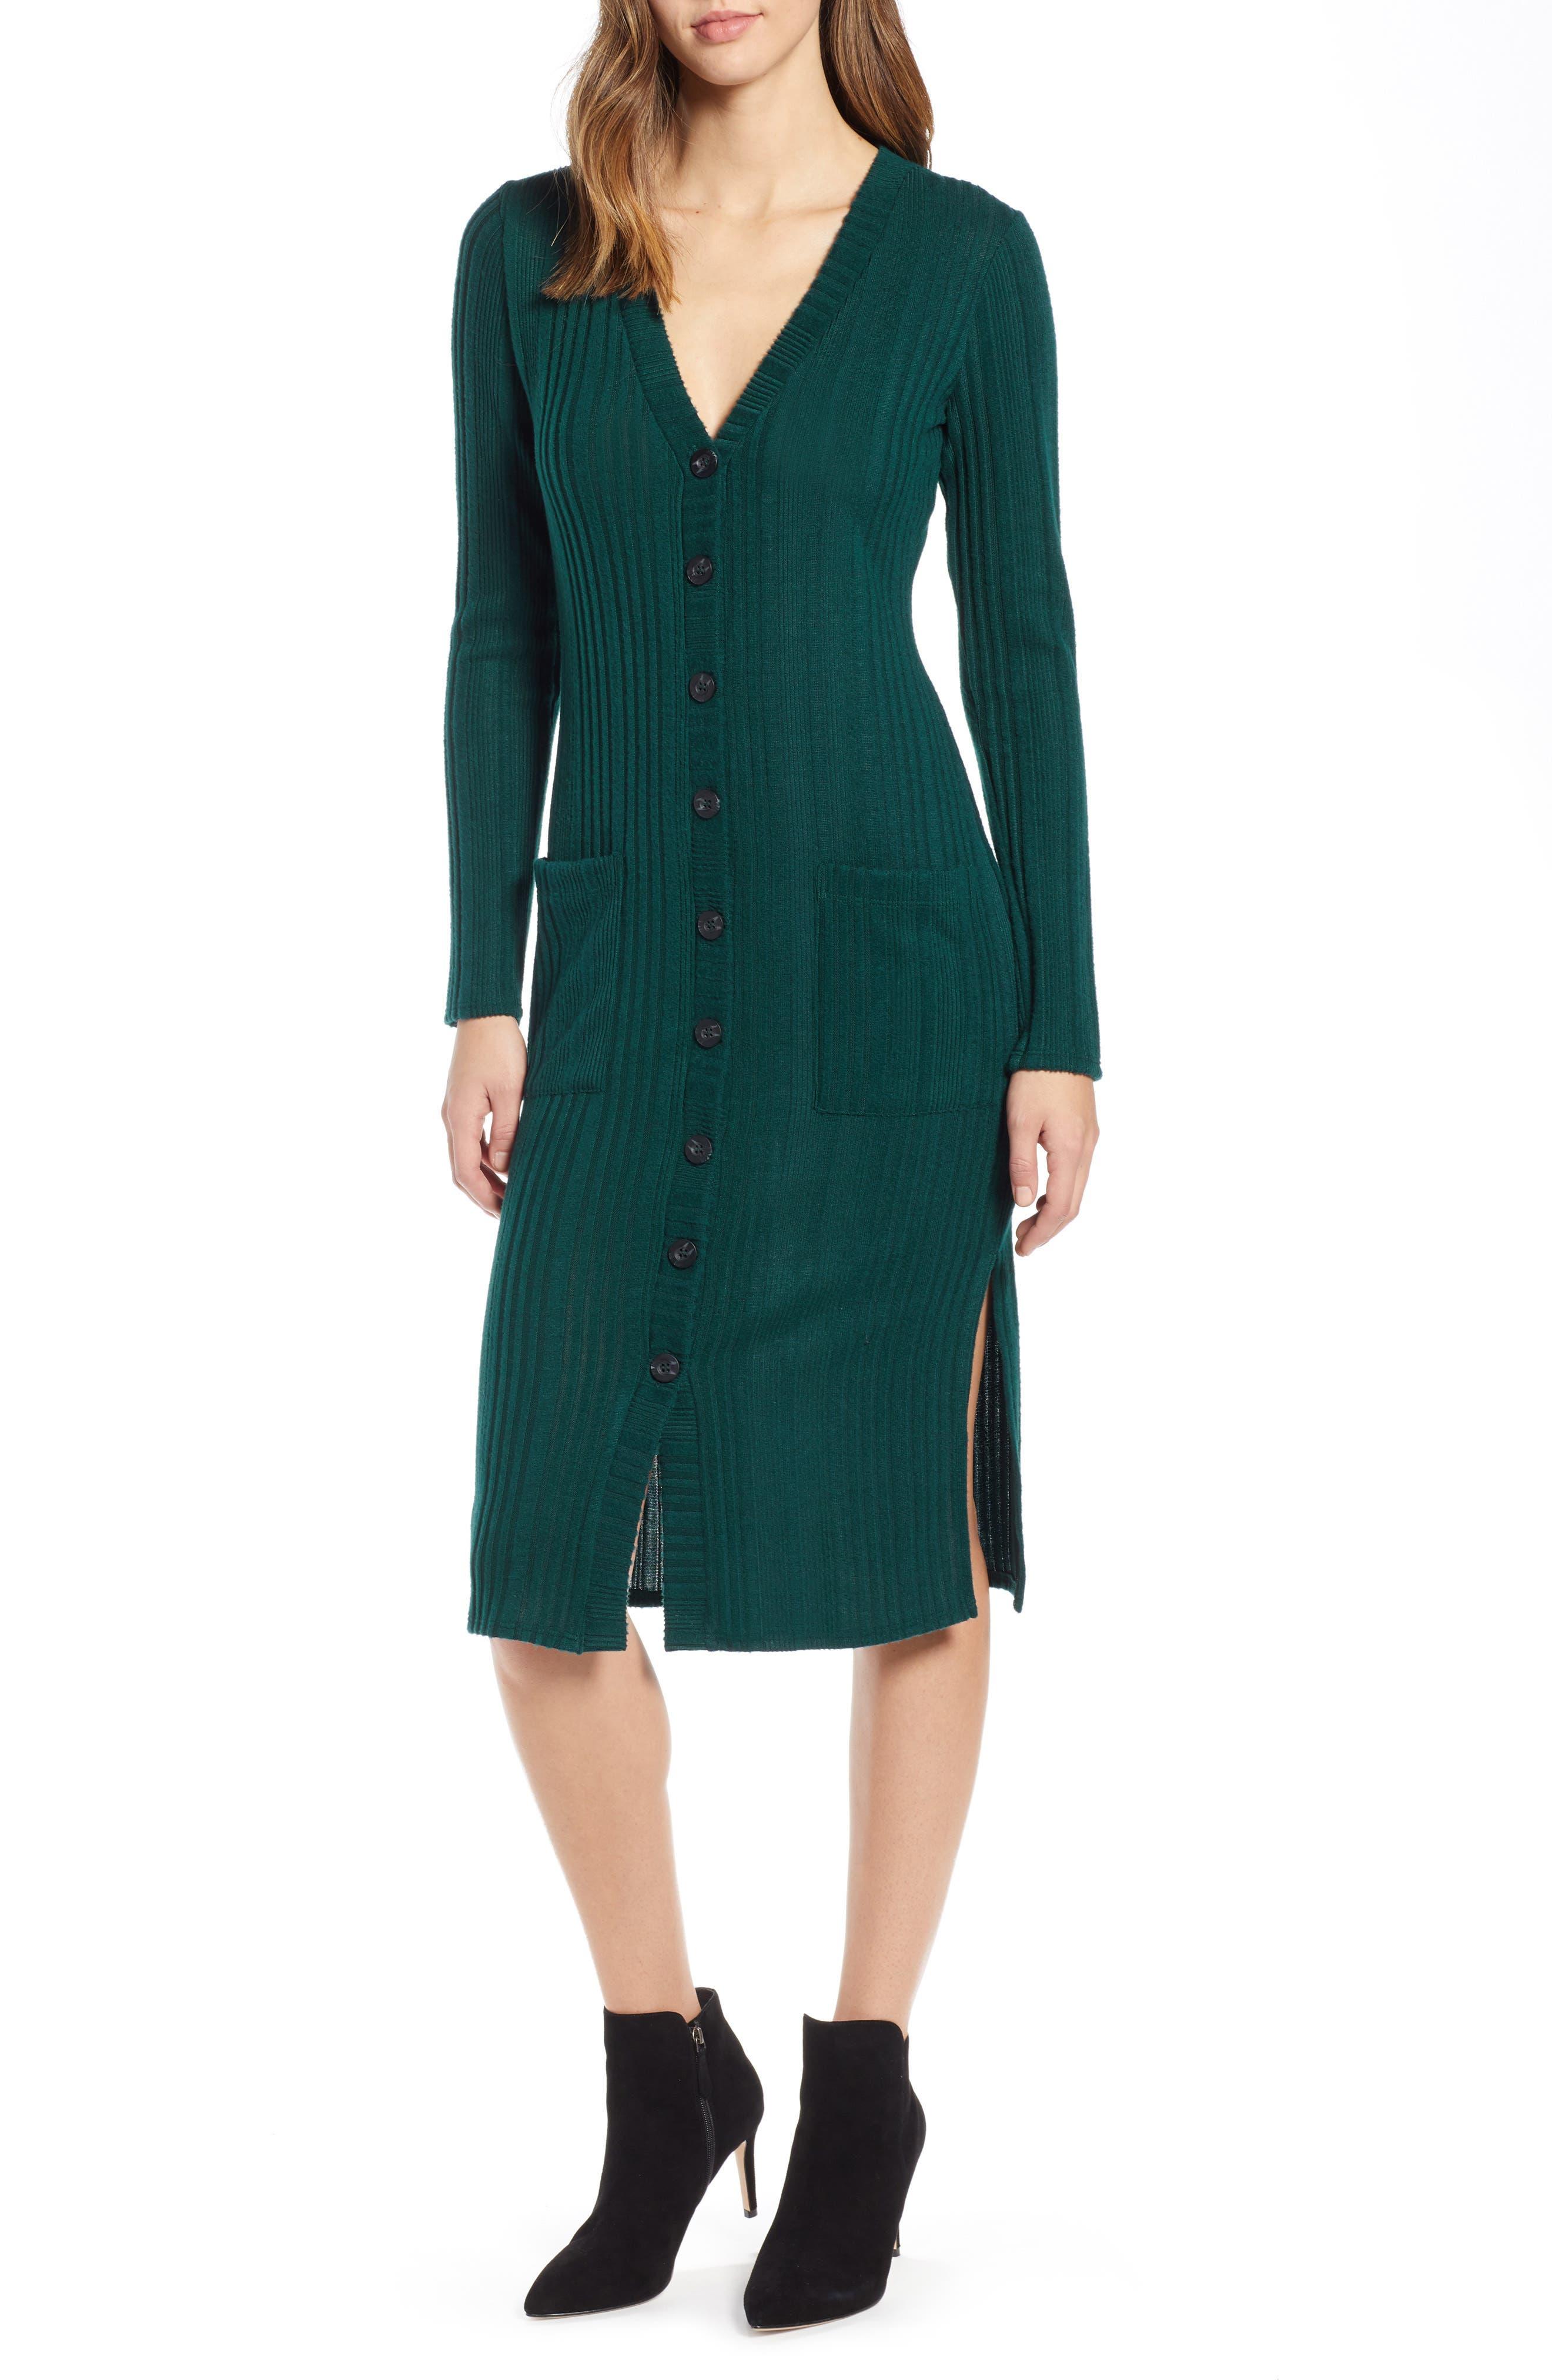 SOCIALITE,                             Sweater Dress,                             Main thumbnail 1, color,                             300